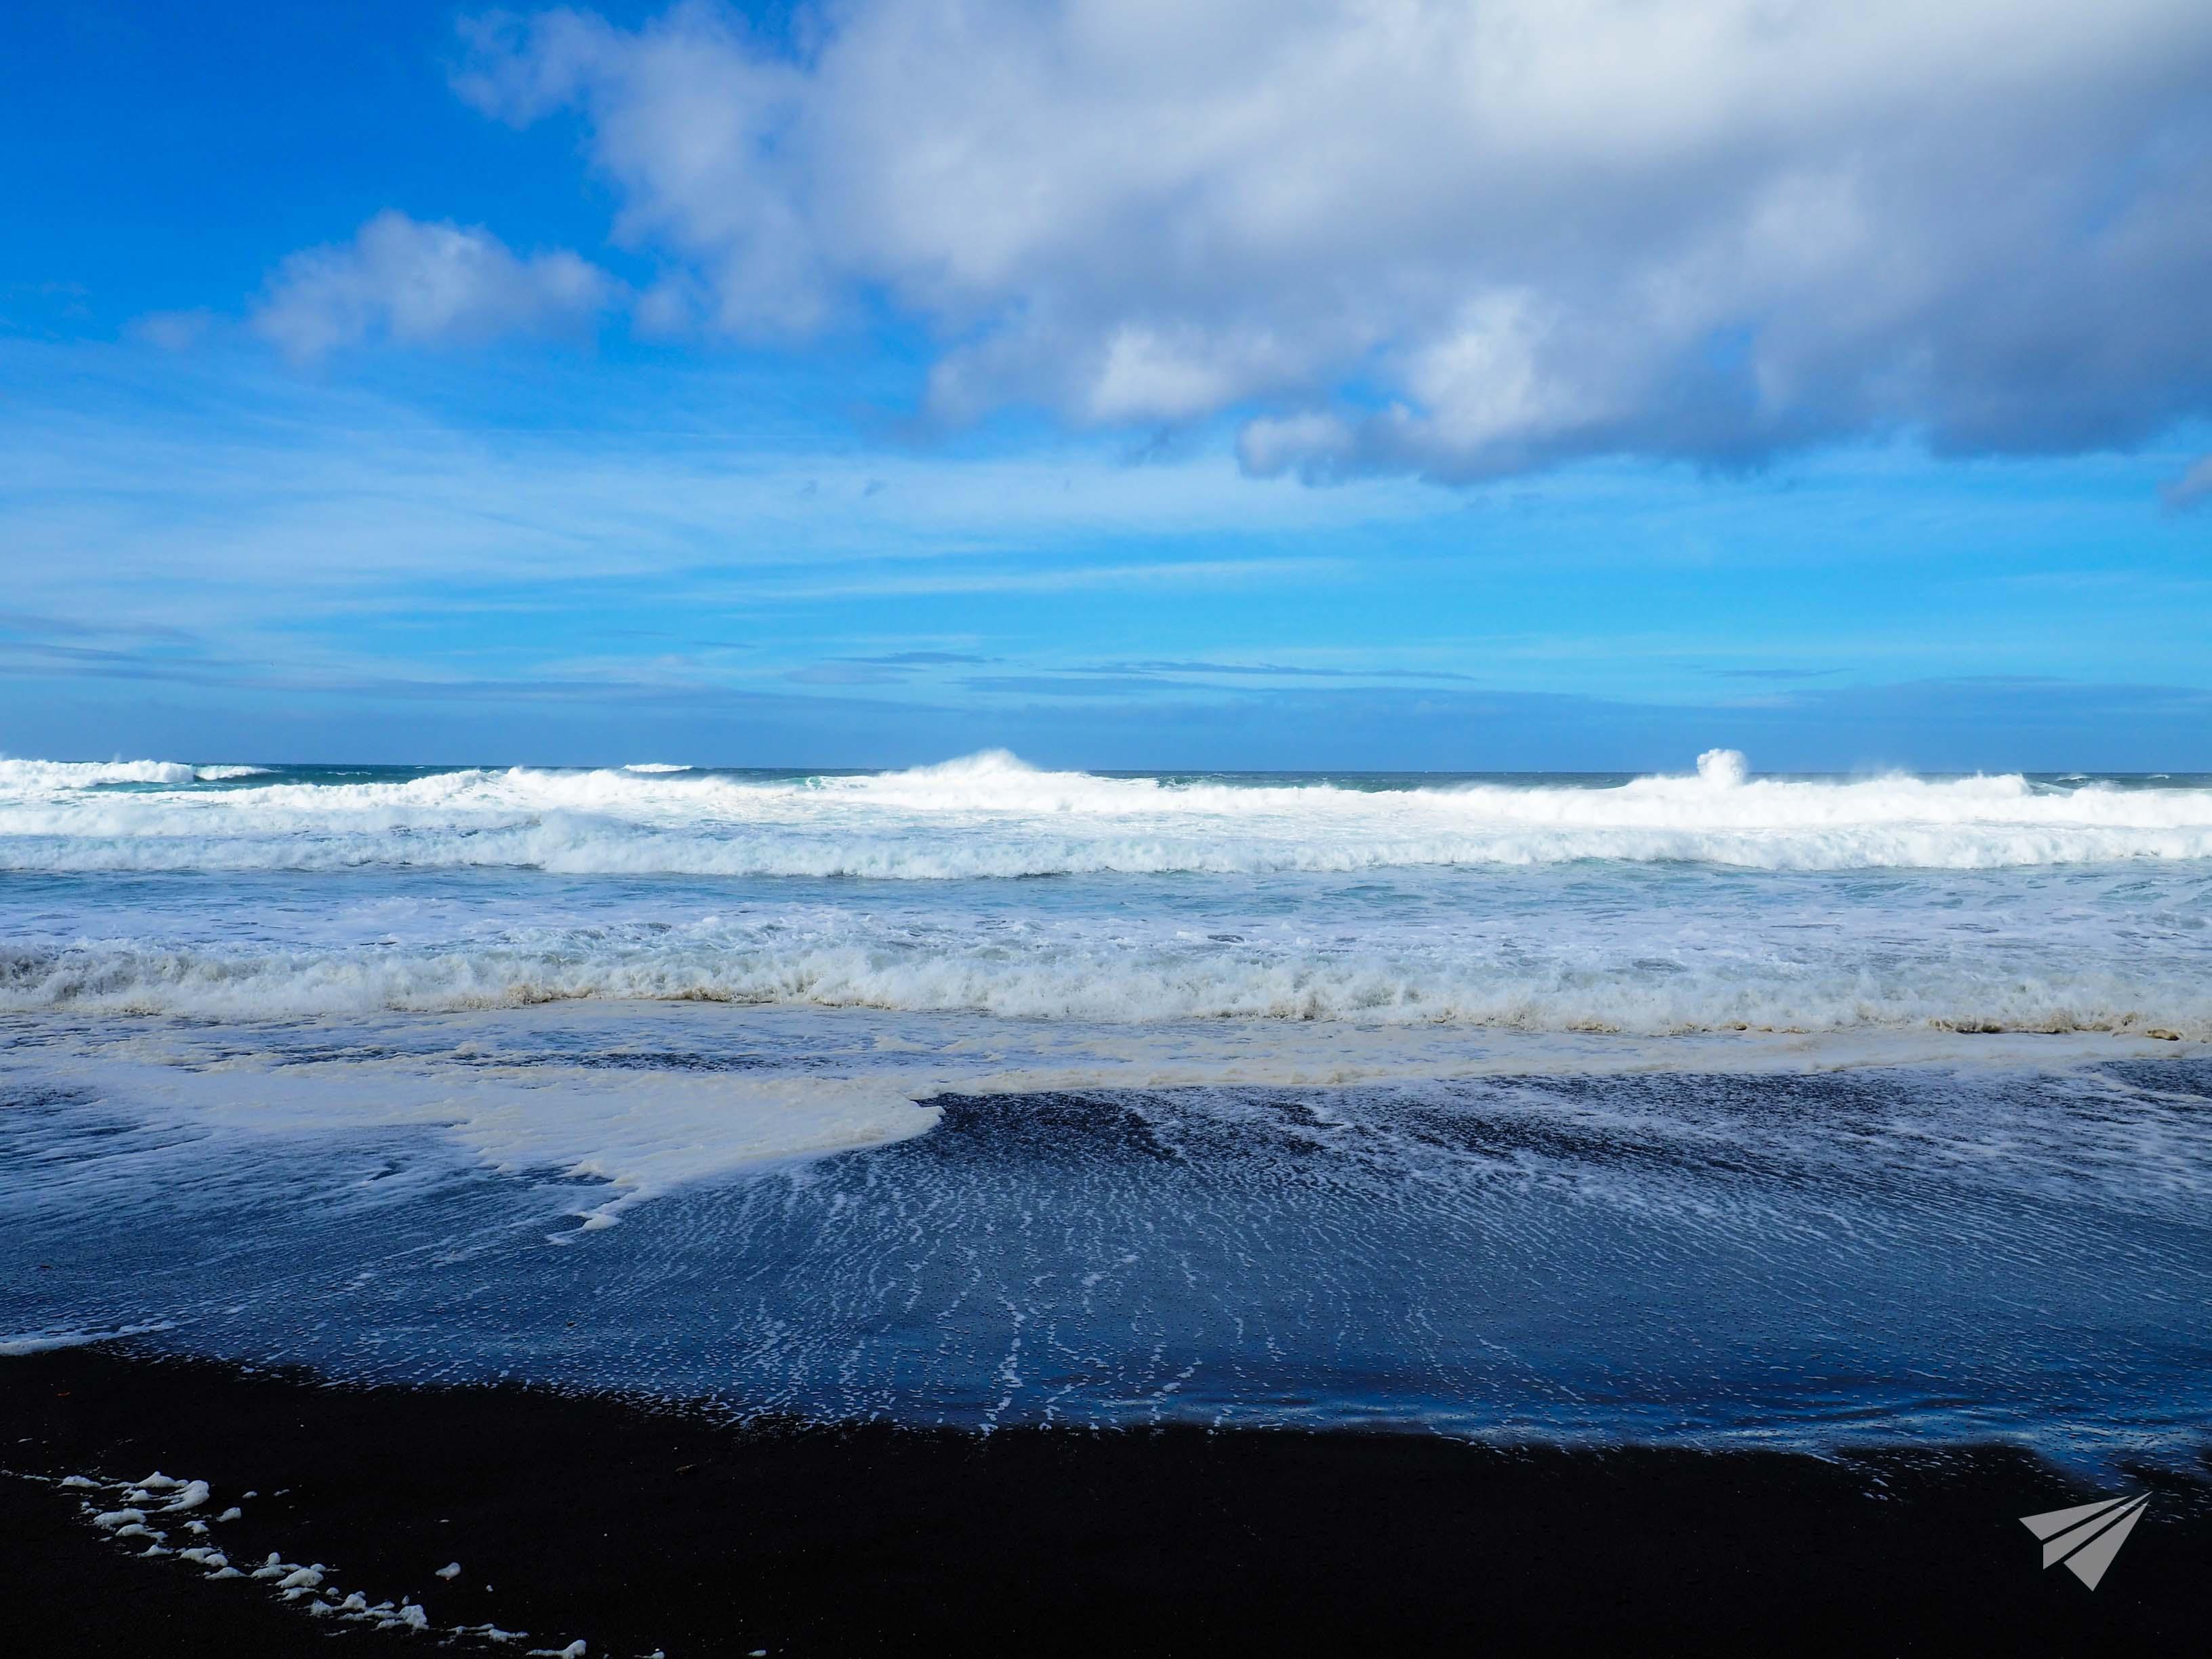 Praia de Santa Barbara вълни